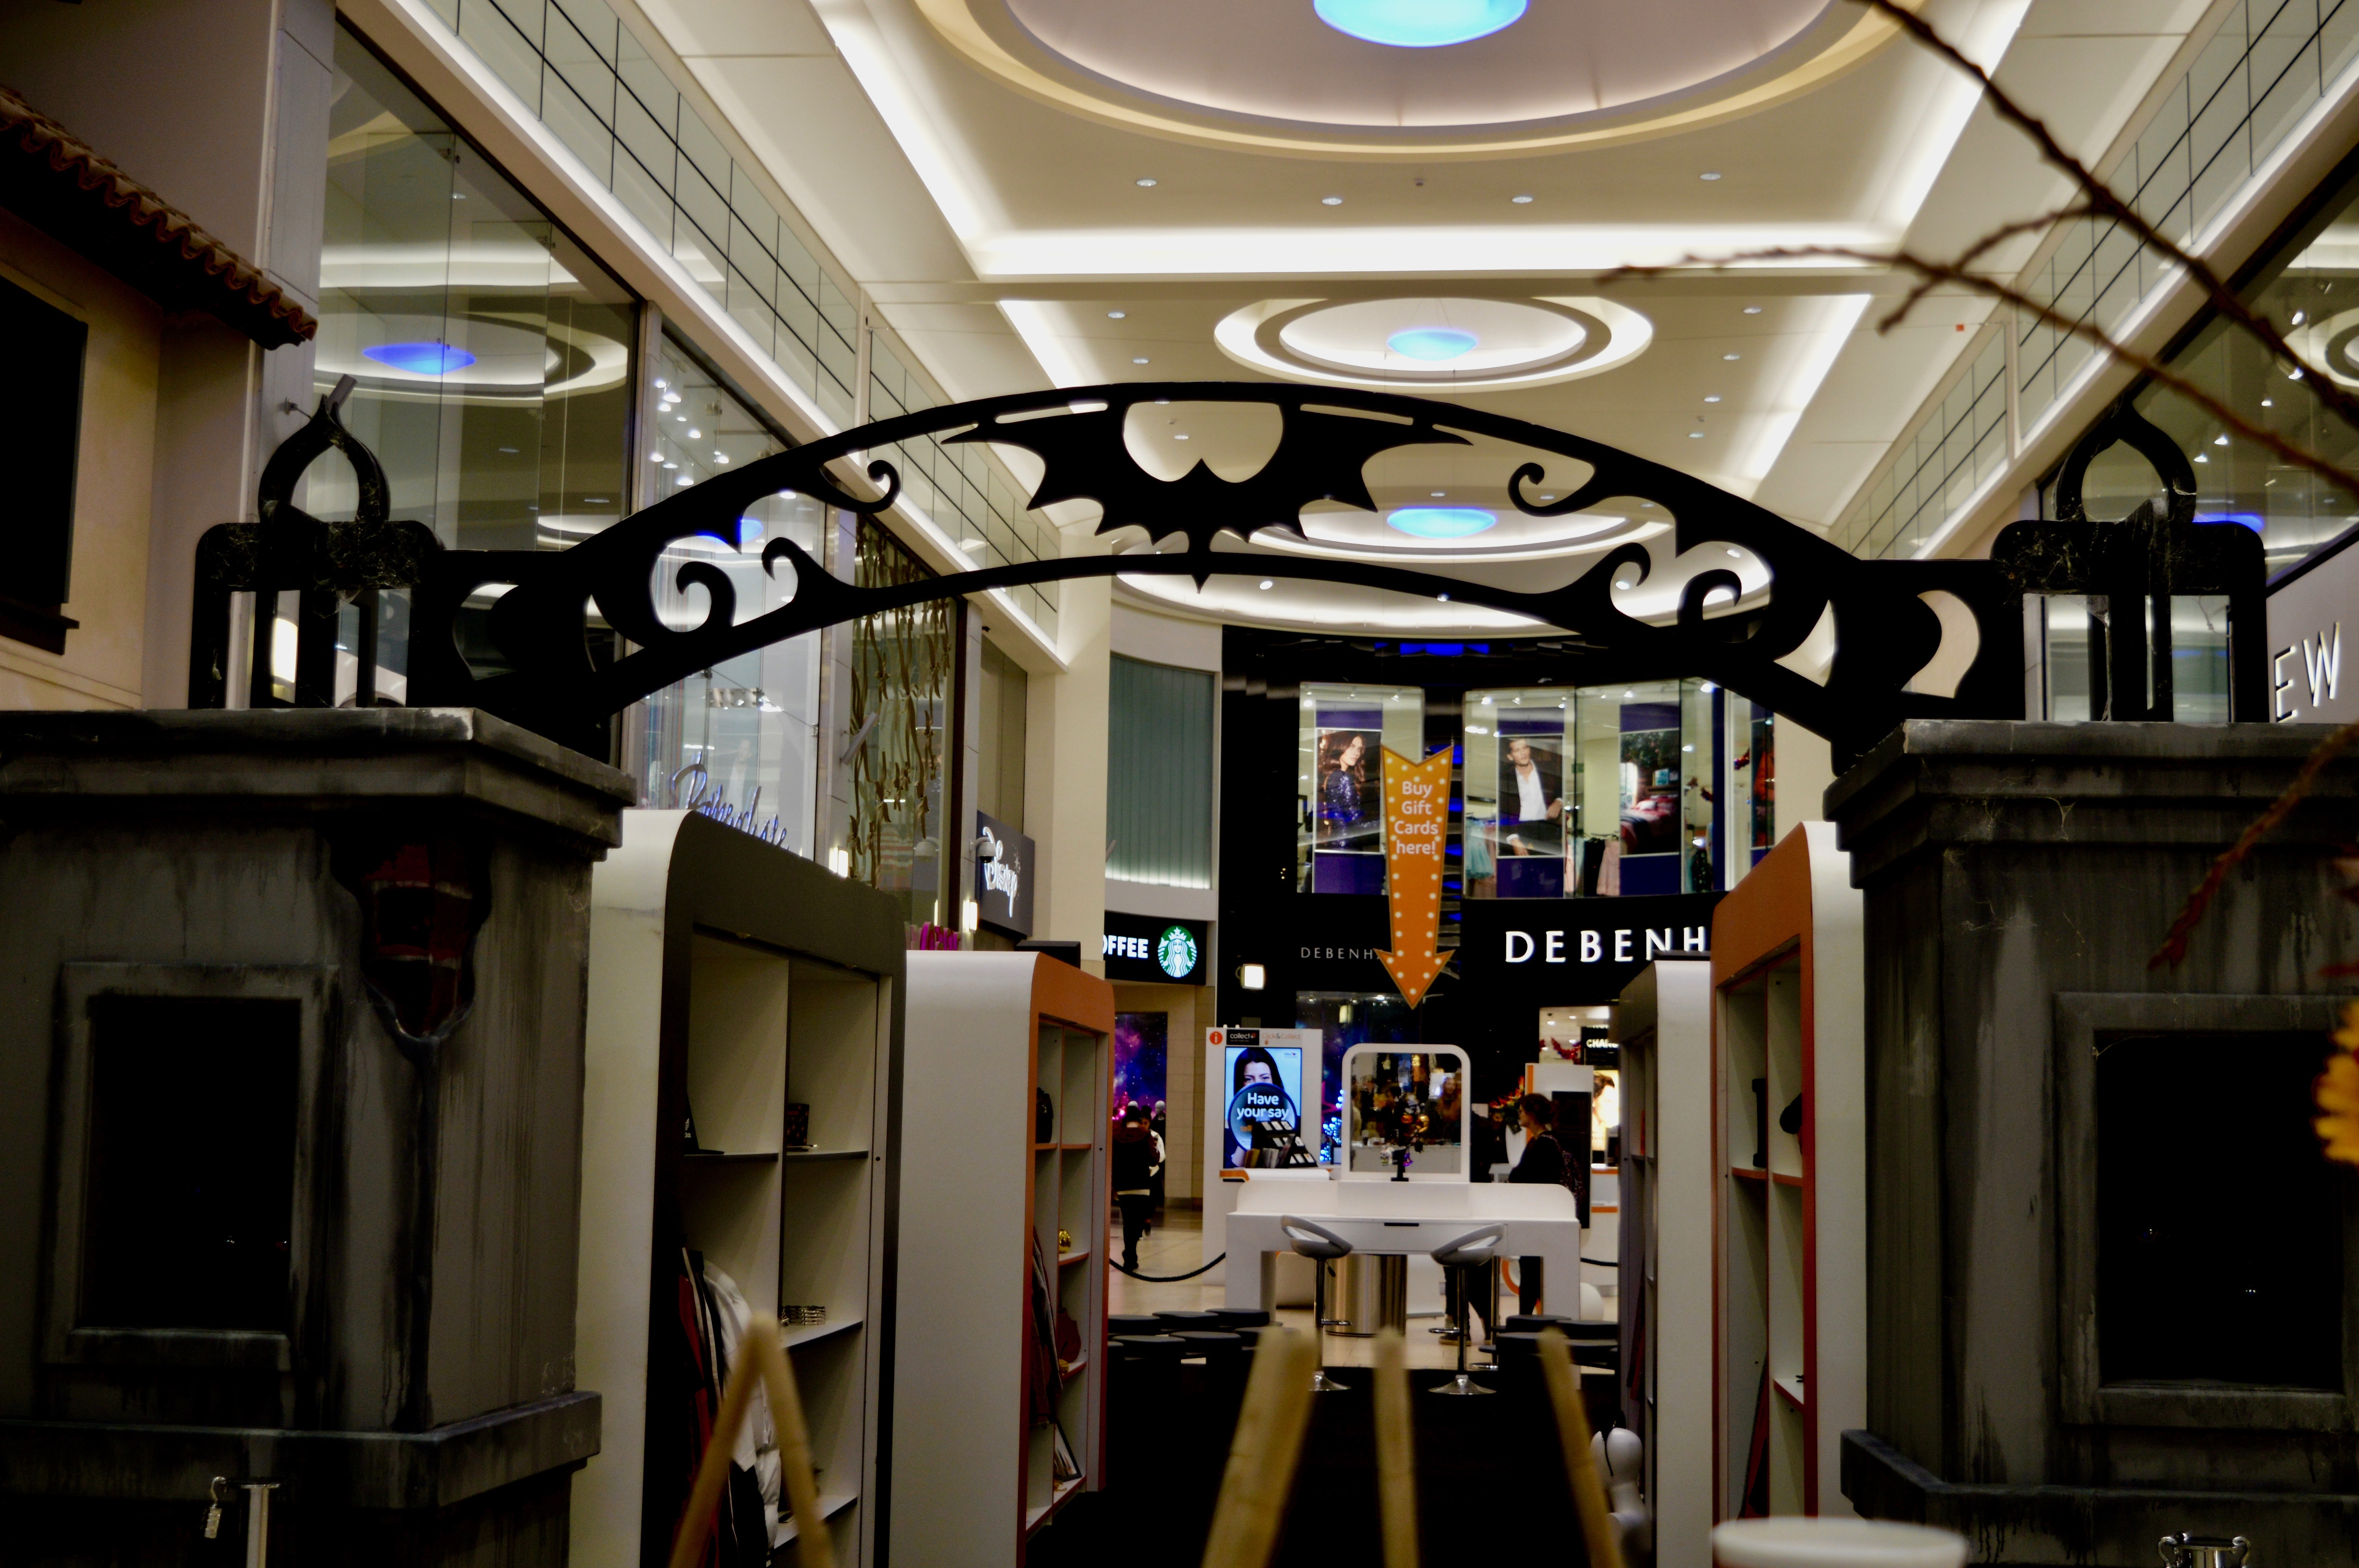 spooky-wardrobe-intu-eldon-square-winter-fashion-stylissimo-newcastle-high-street-halloween-elle-blonde-luxury-lifestyle-destination-blog